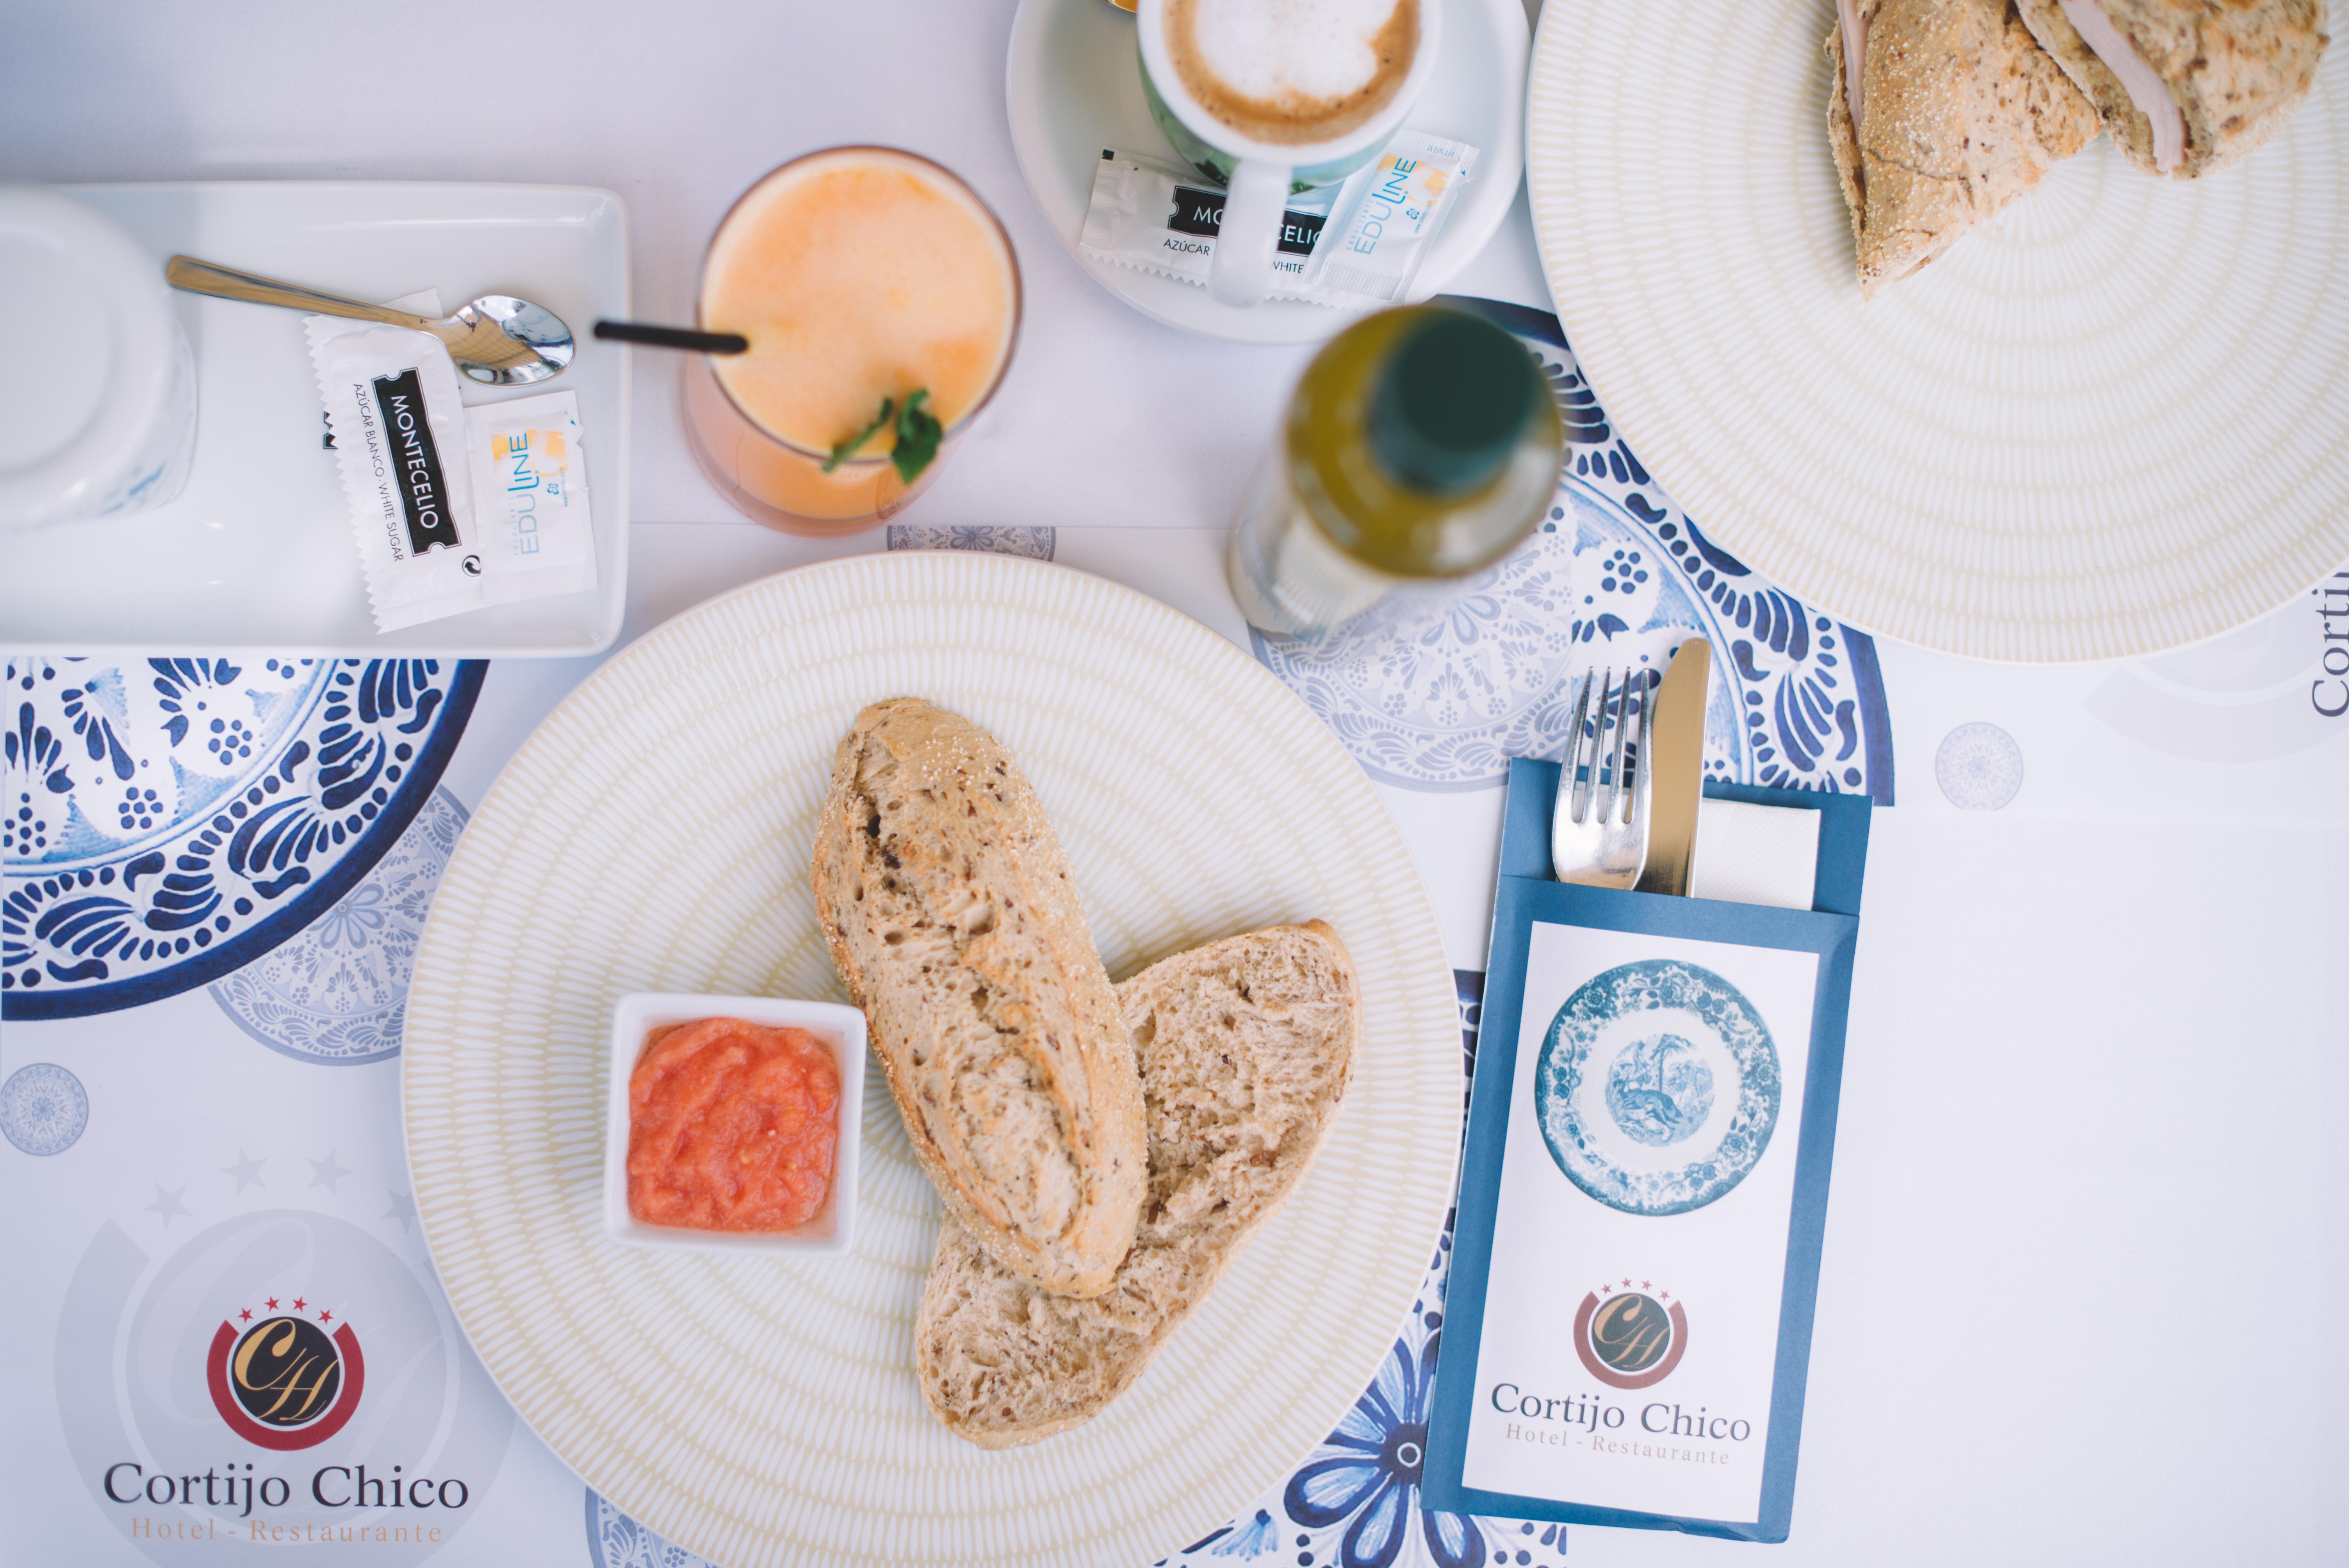 pan integral, tomate, aceite, desayuno andaluz